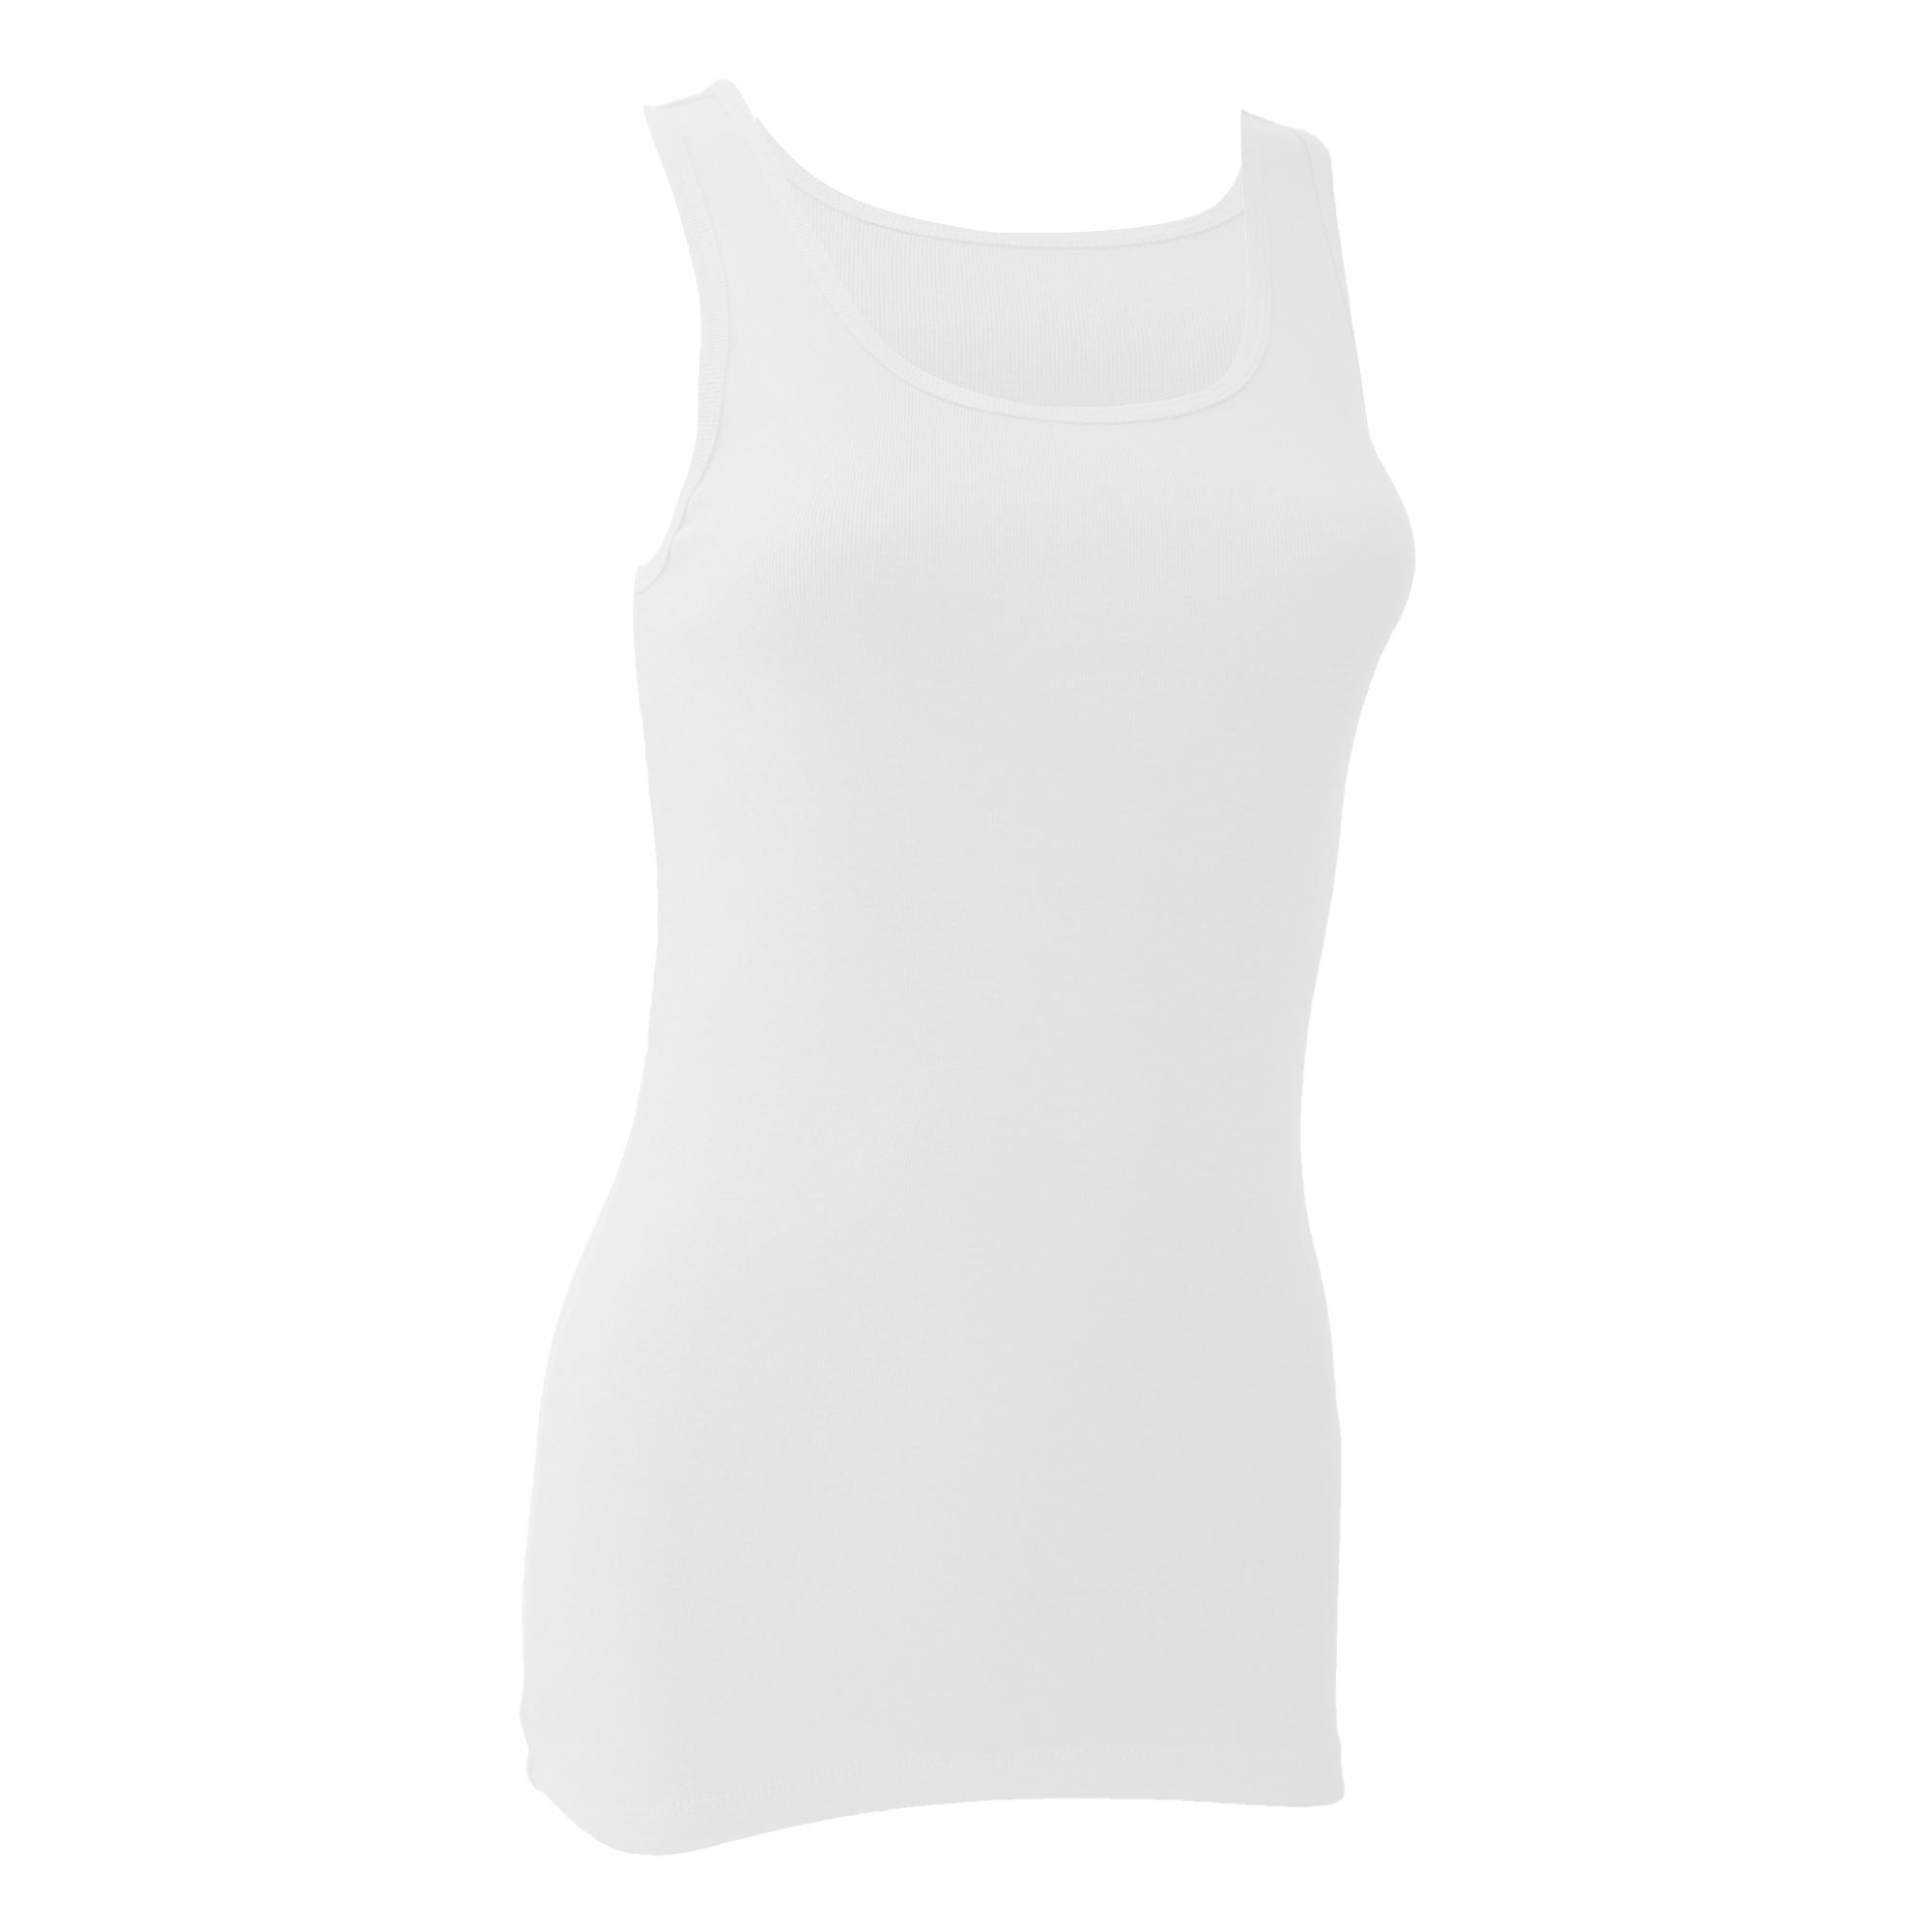 Bella + Canvas Ladies/Womens Tank Top (M) (White)